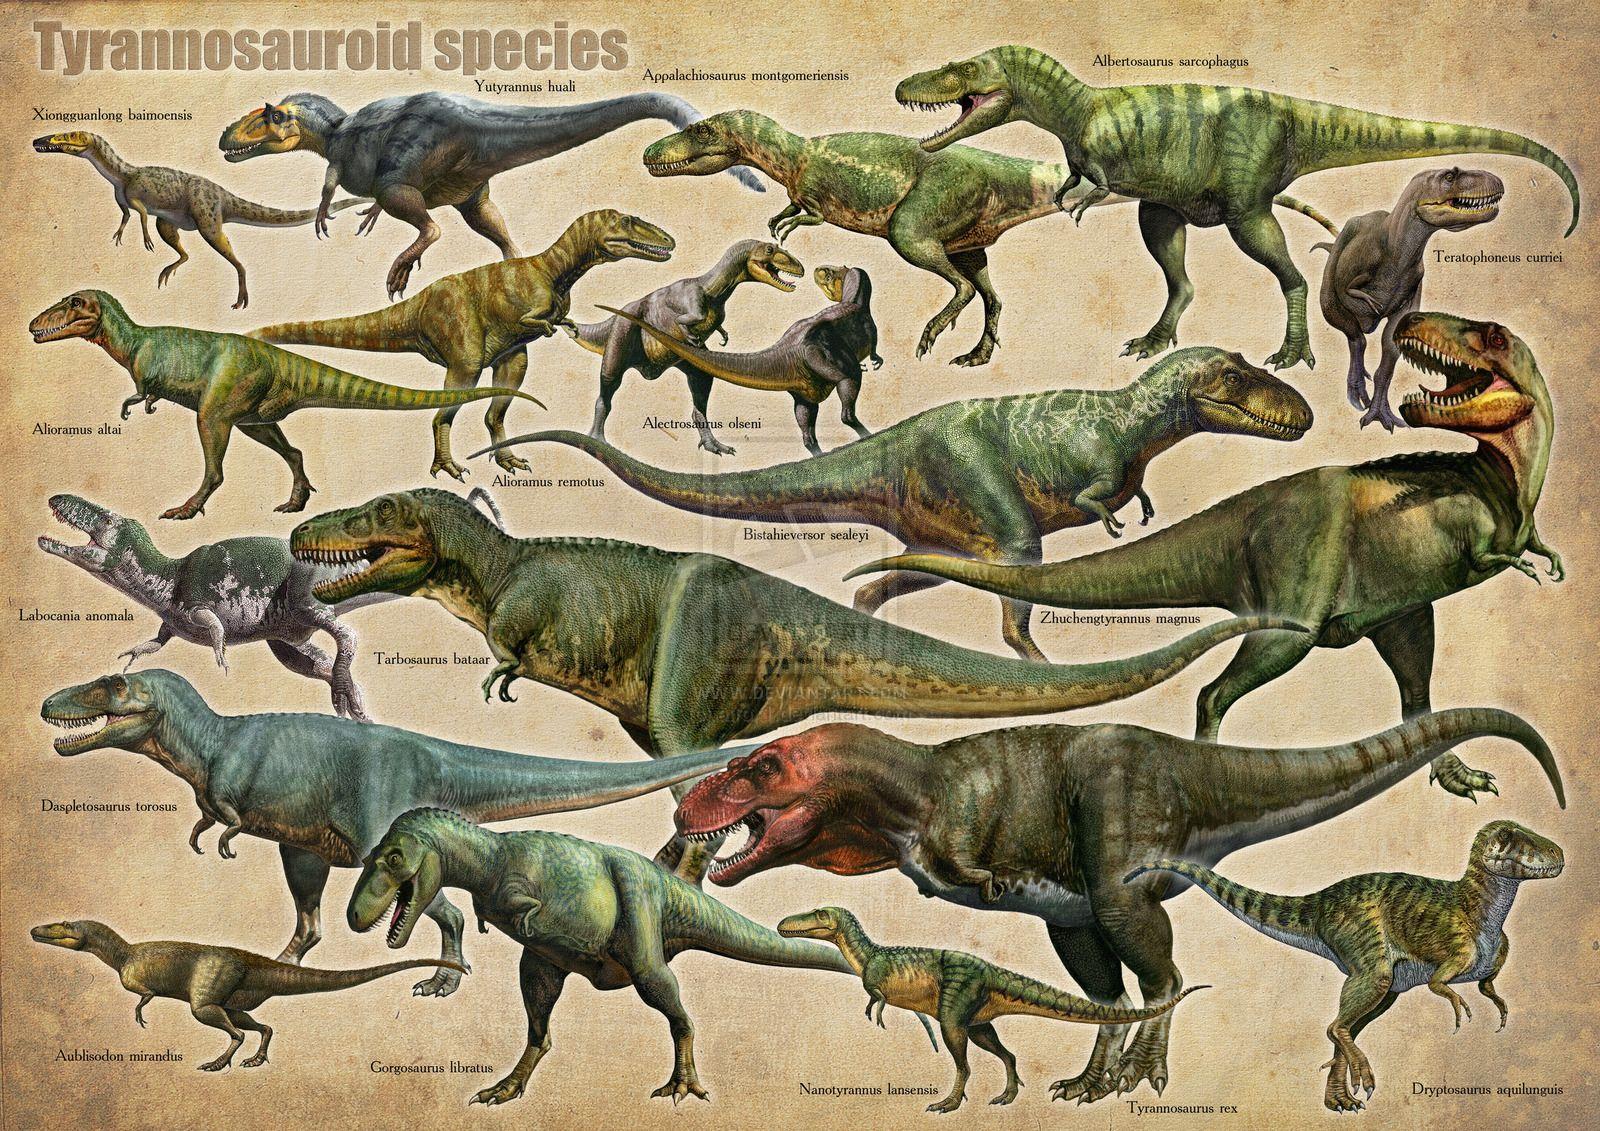 tyrannosaurs by on DeviantArt